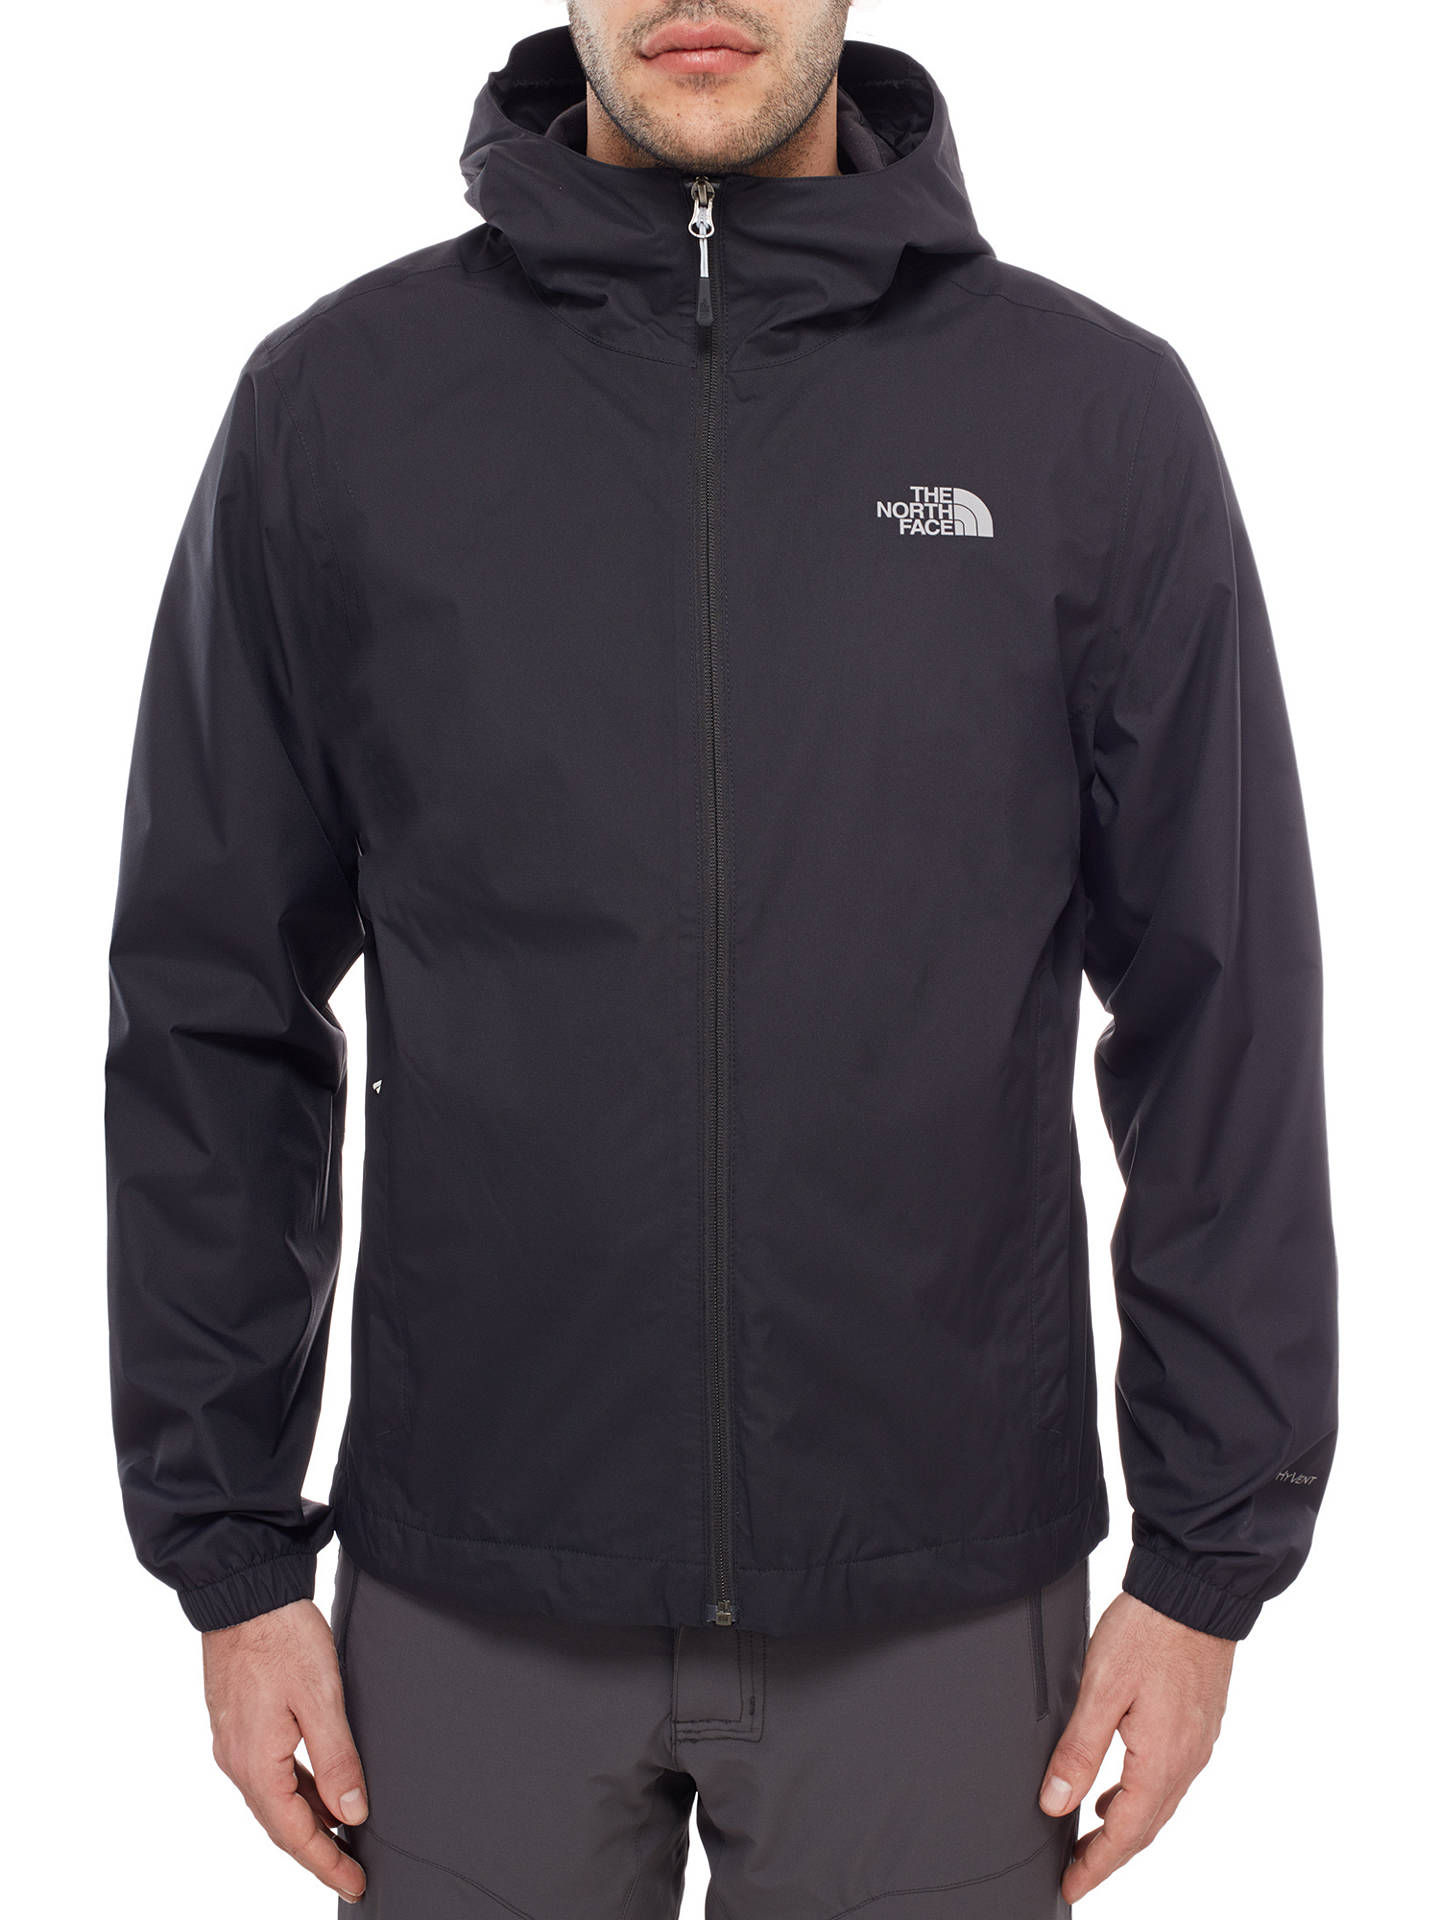 166c992e3 The North Face Quest Waterproof Men's Jacket, Black